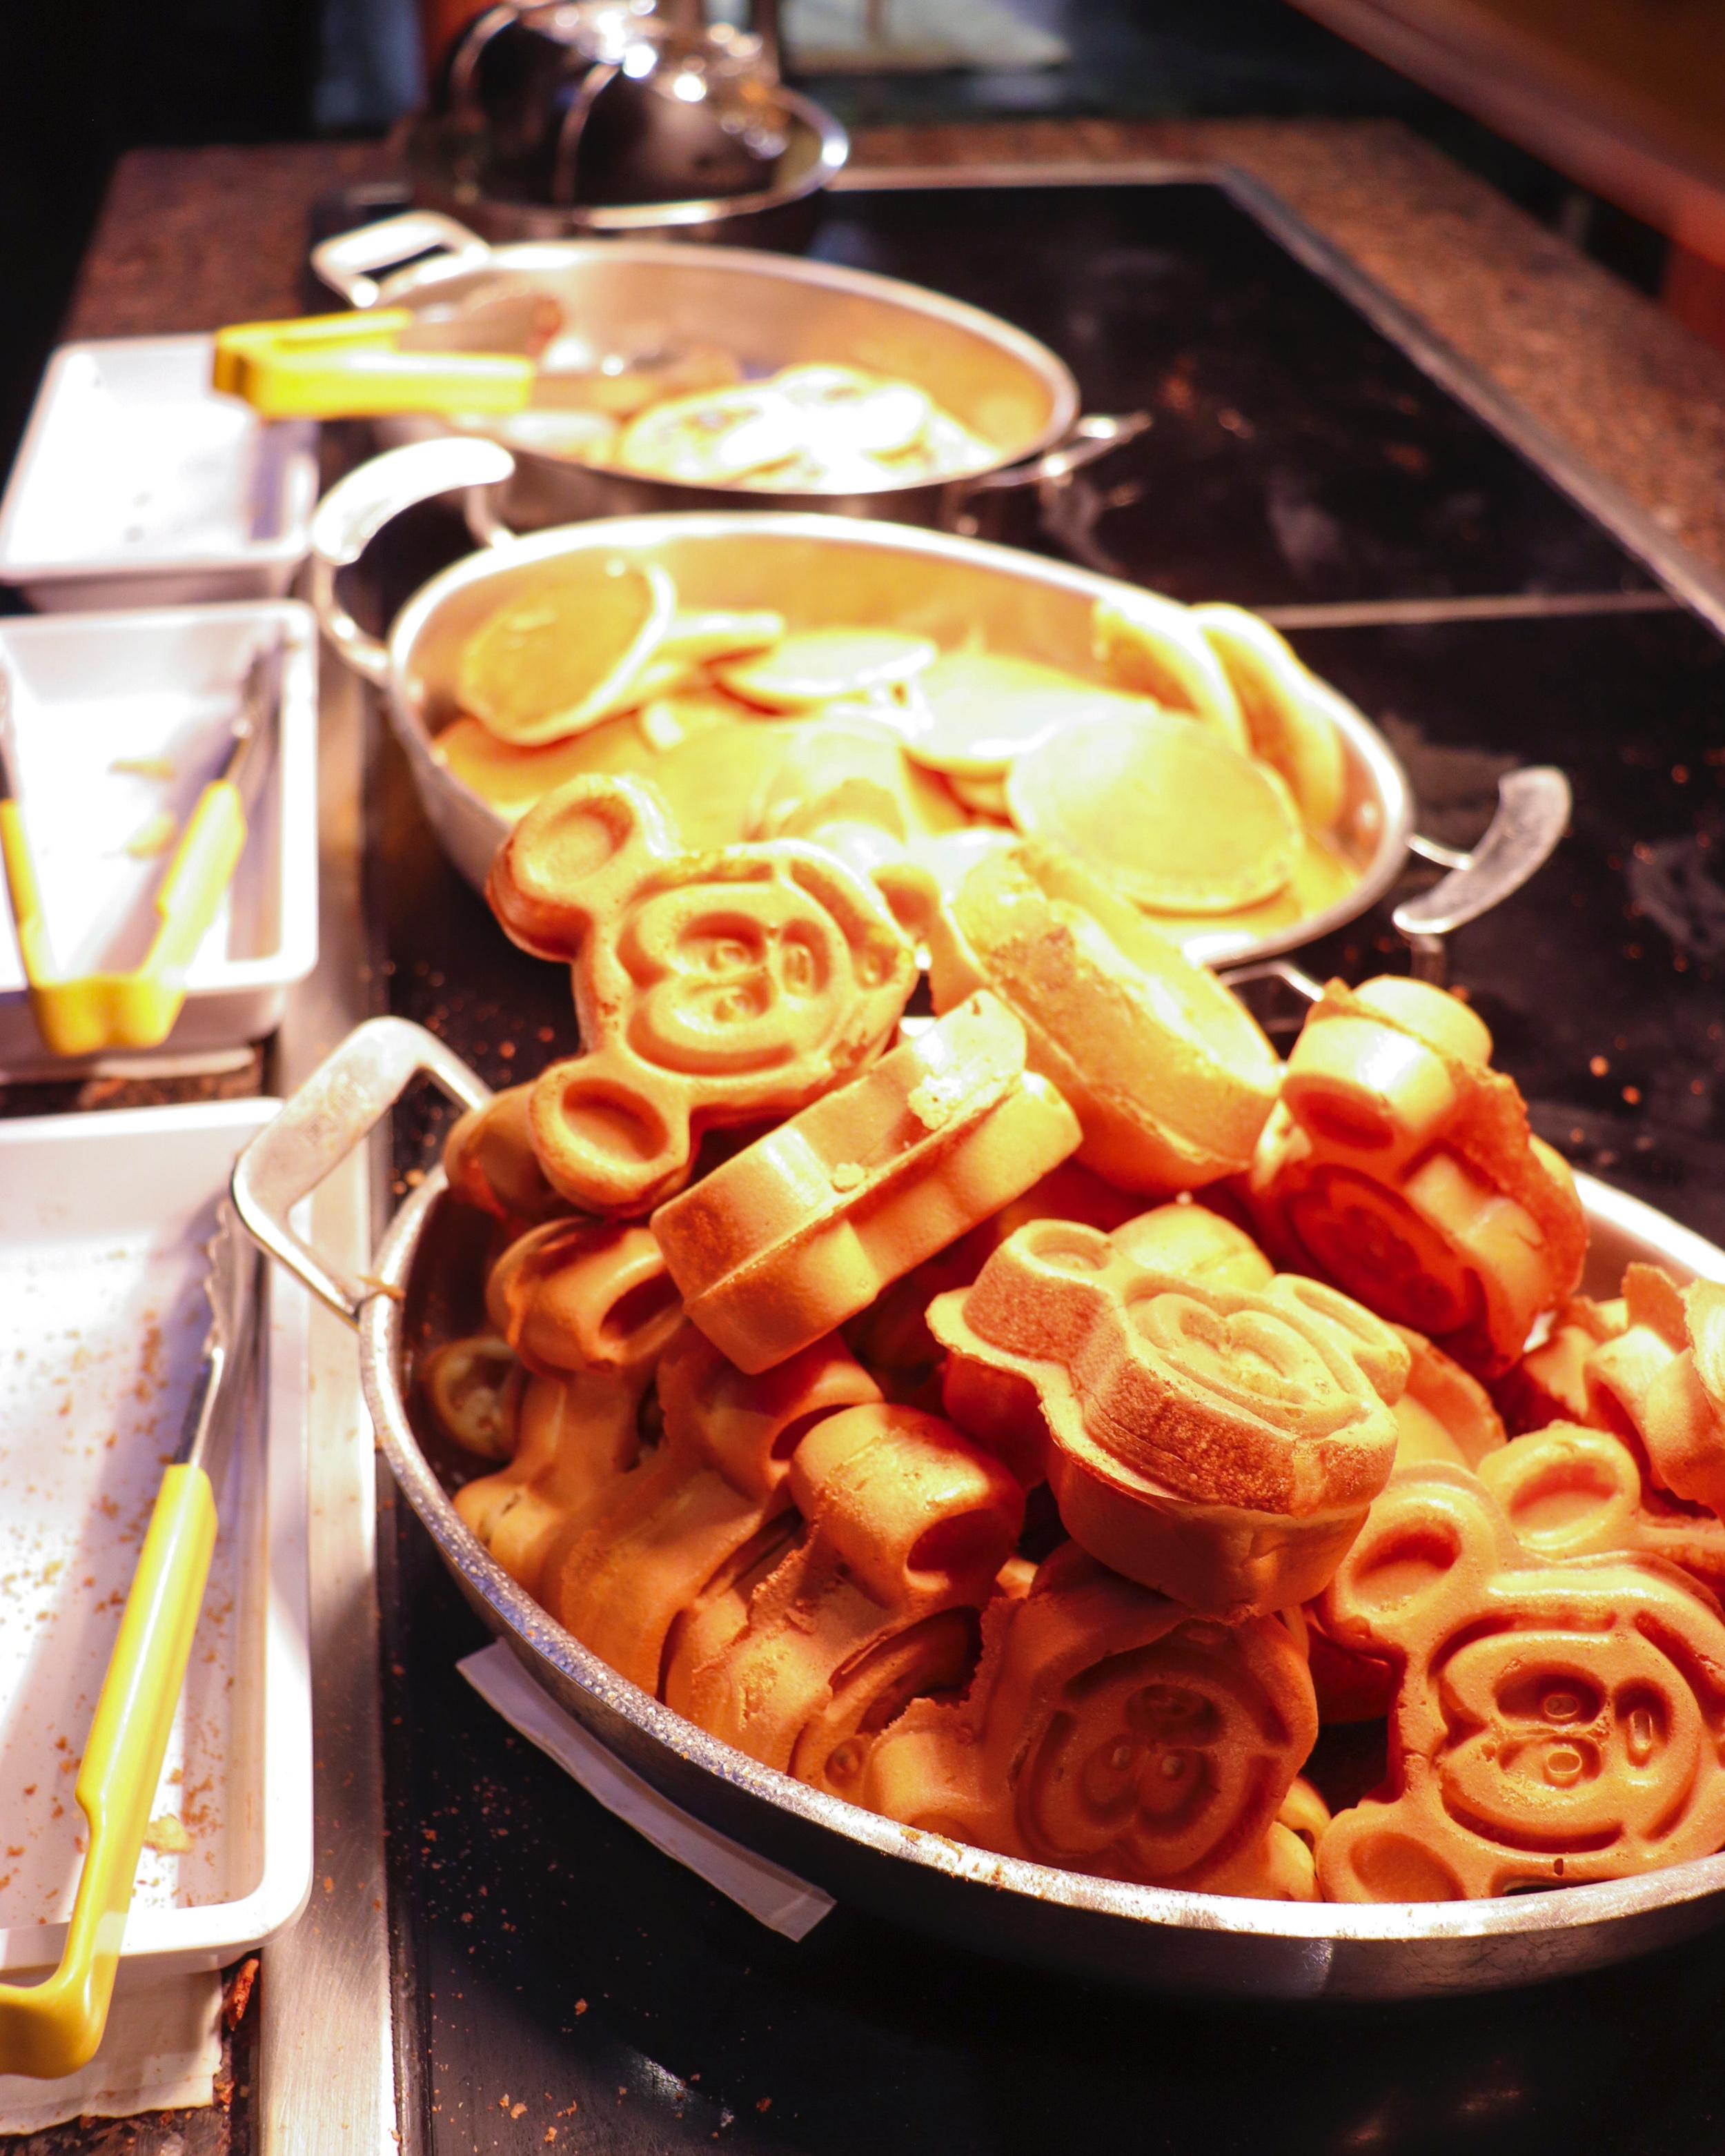 Mmm Mickey Waffles.